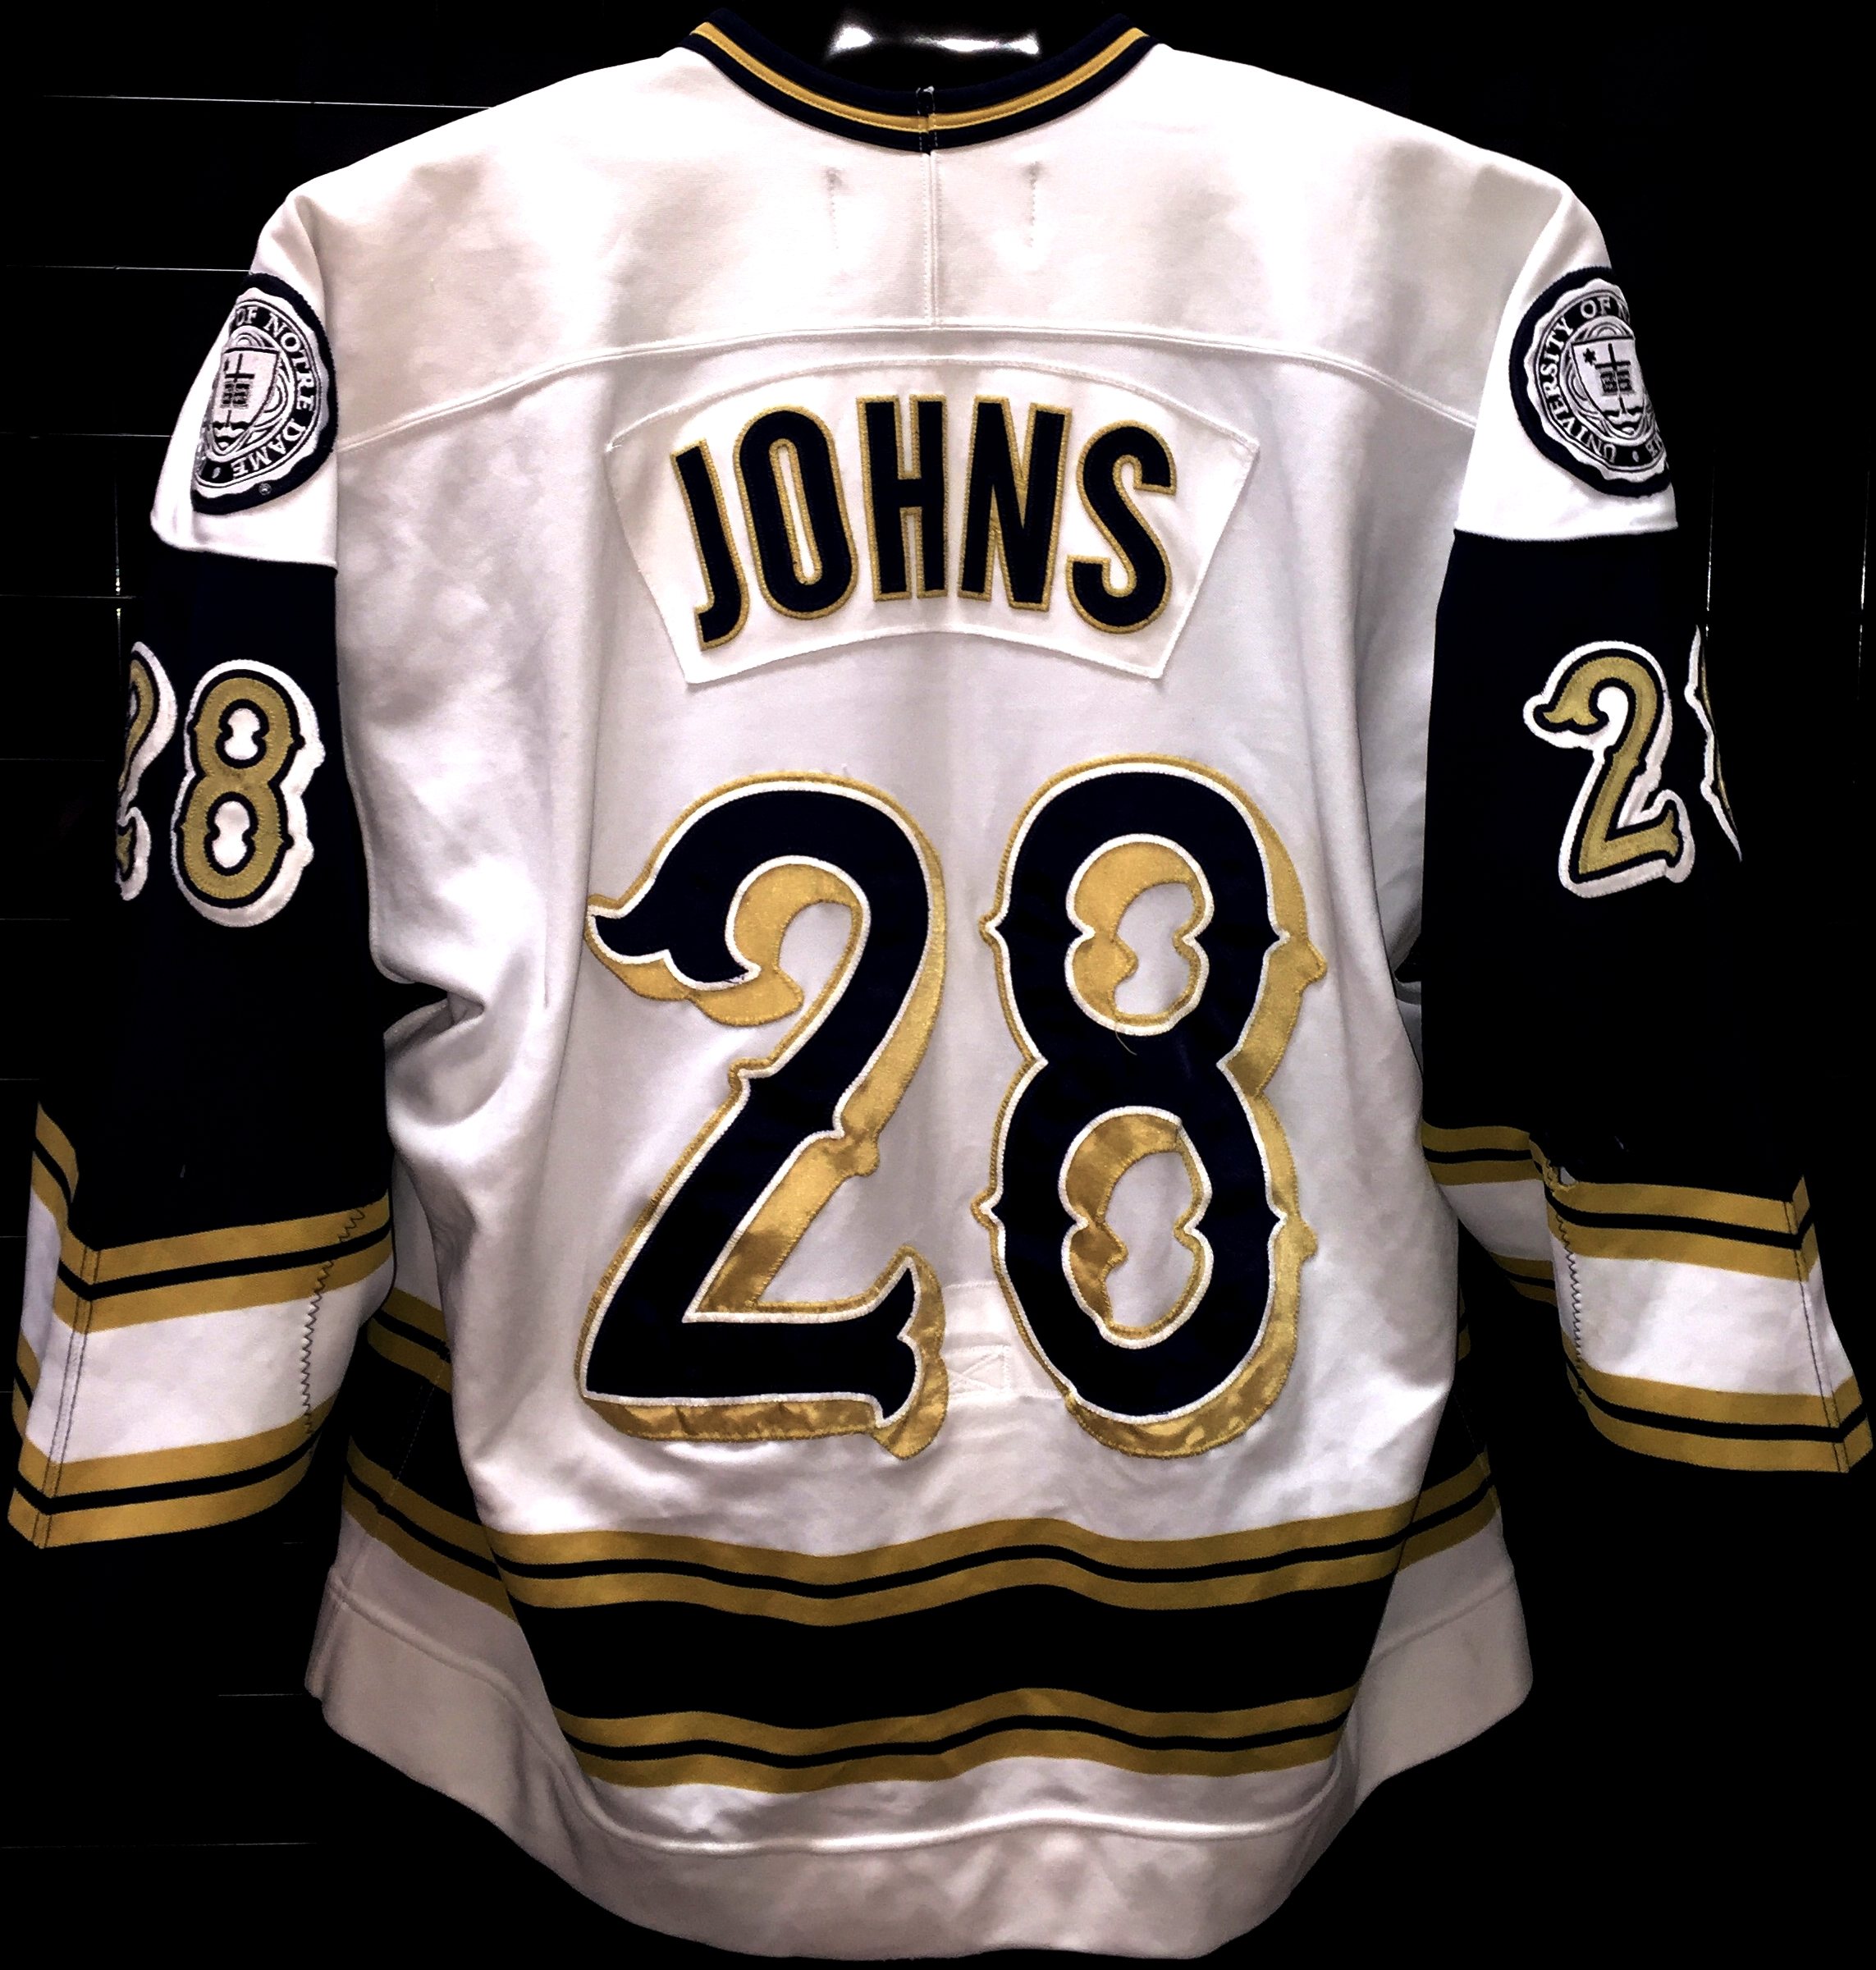 best service 4e878 6ecb0 Stephen Johns - Notre Dame - Game Used/Worn Jerseys - GV Jerseys